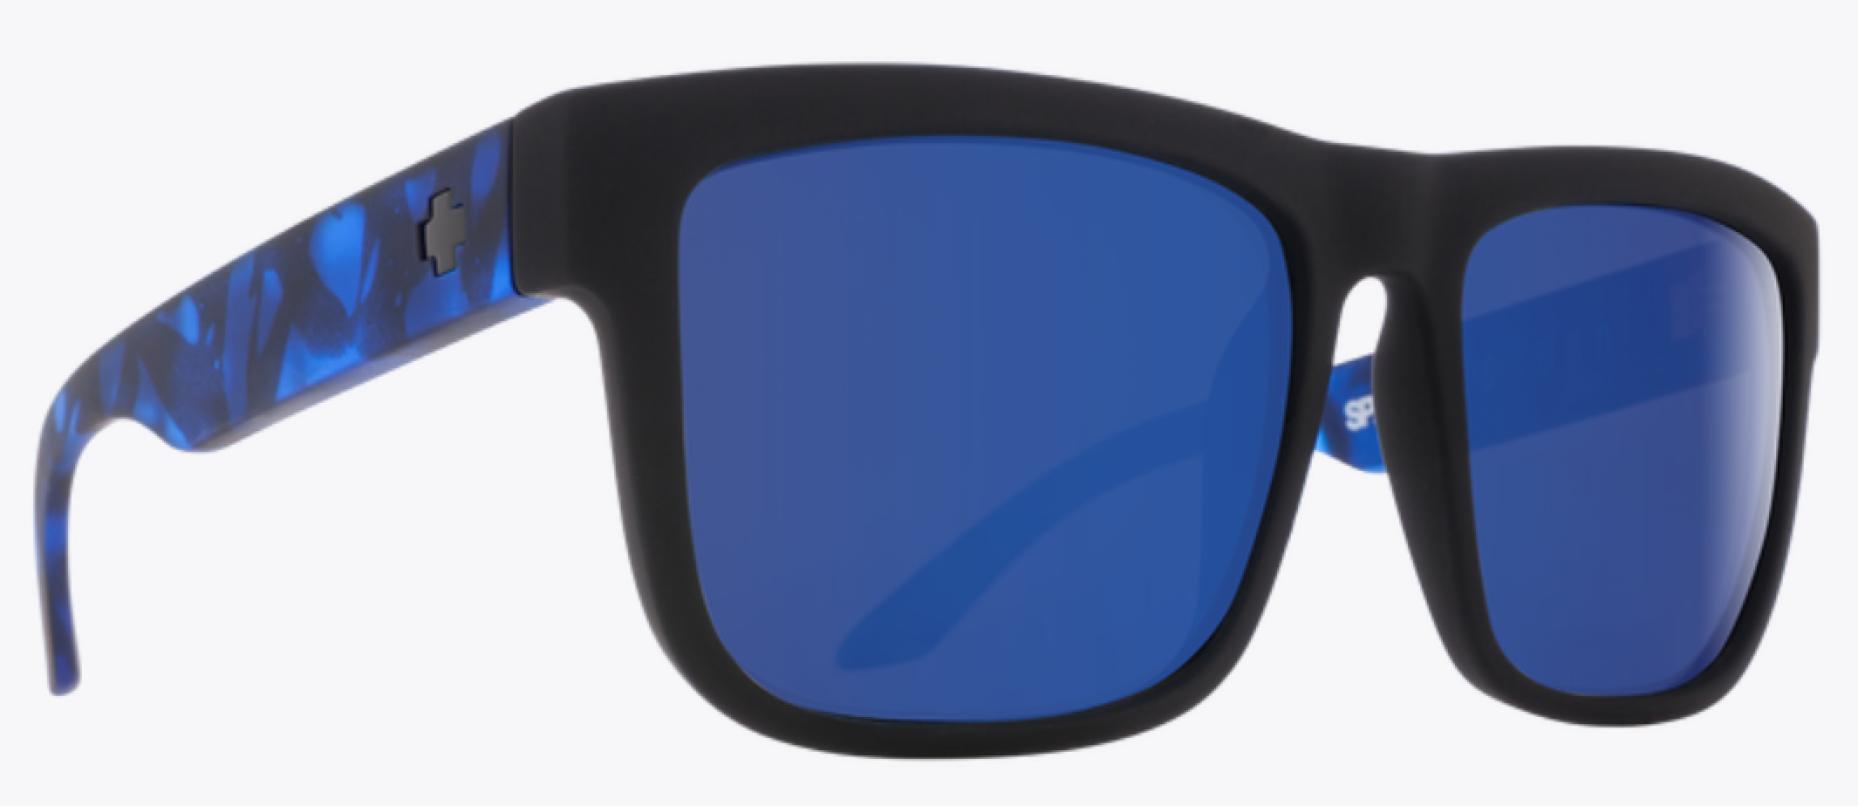 SPY DISCORD SFT MAT BLK BLUE